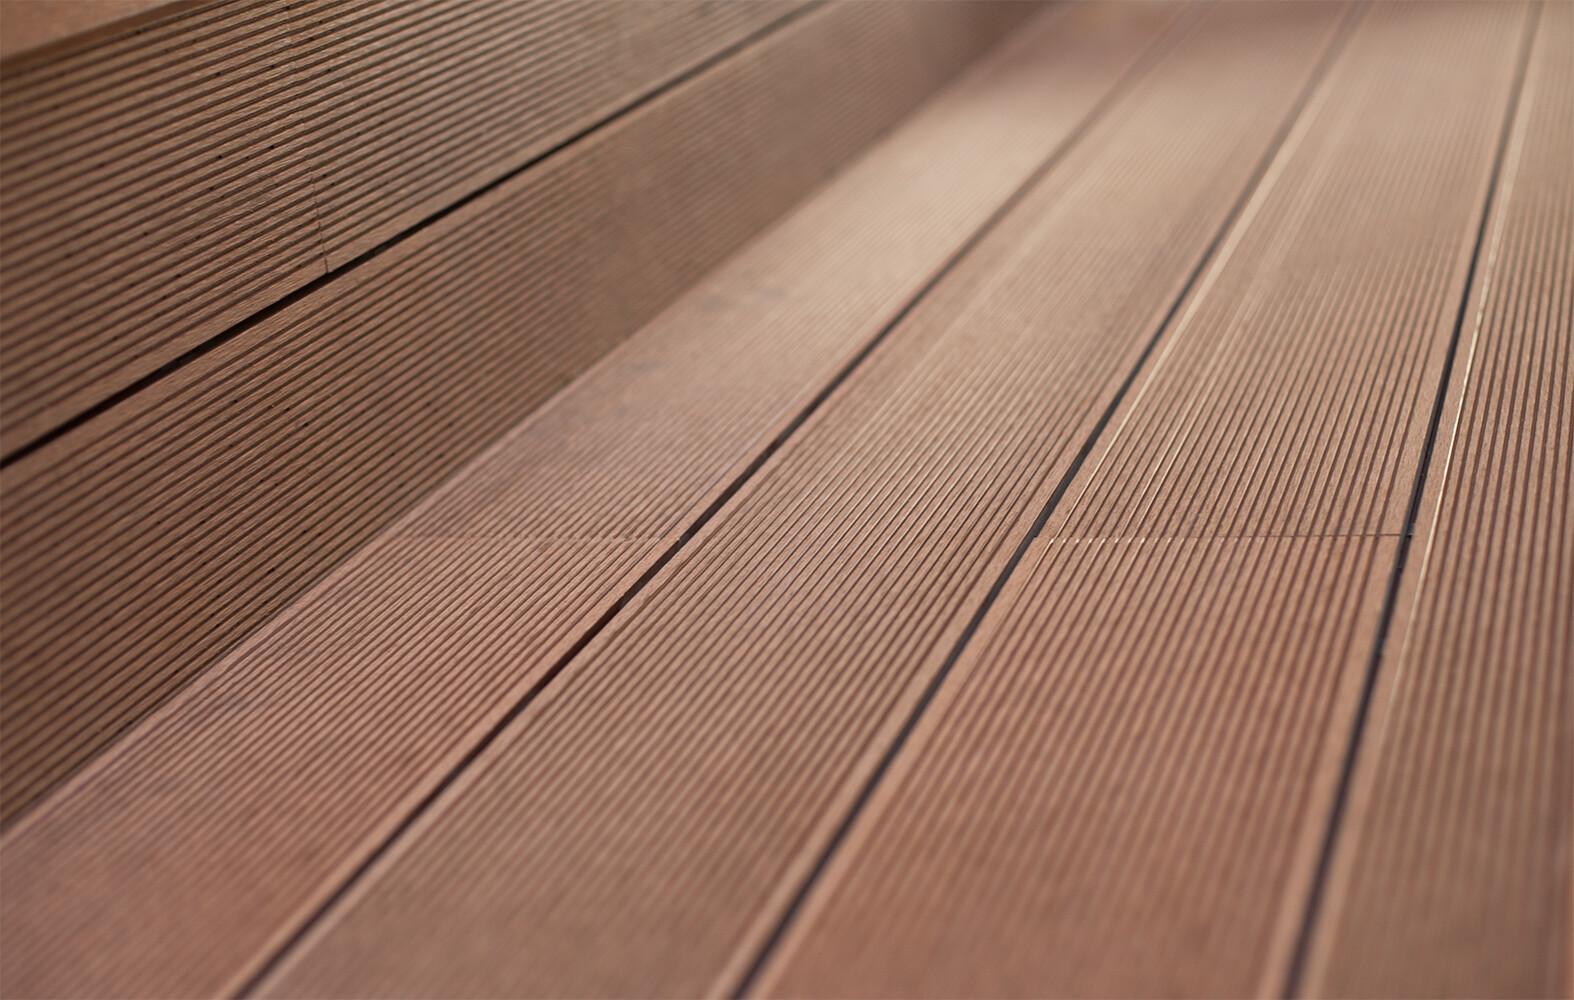 Solardeck™ Bamboo Wood Plastic Composite (WPC) Outdoor Decking ...